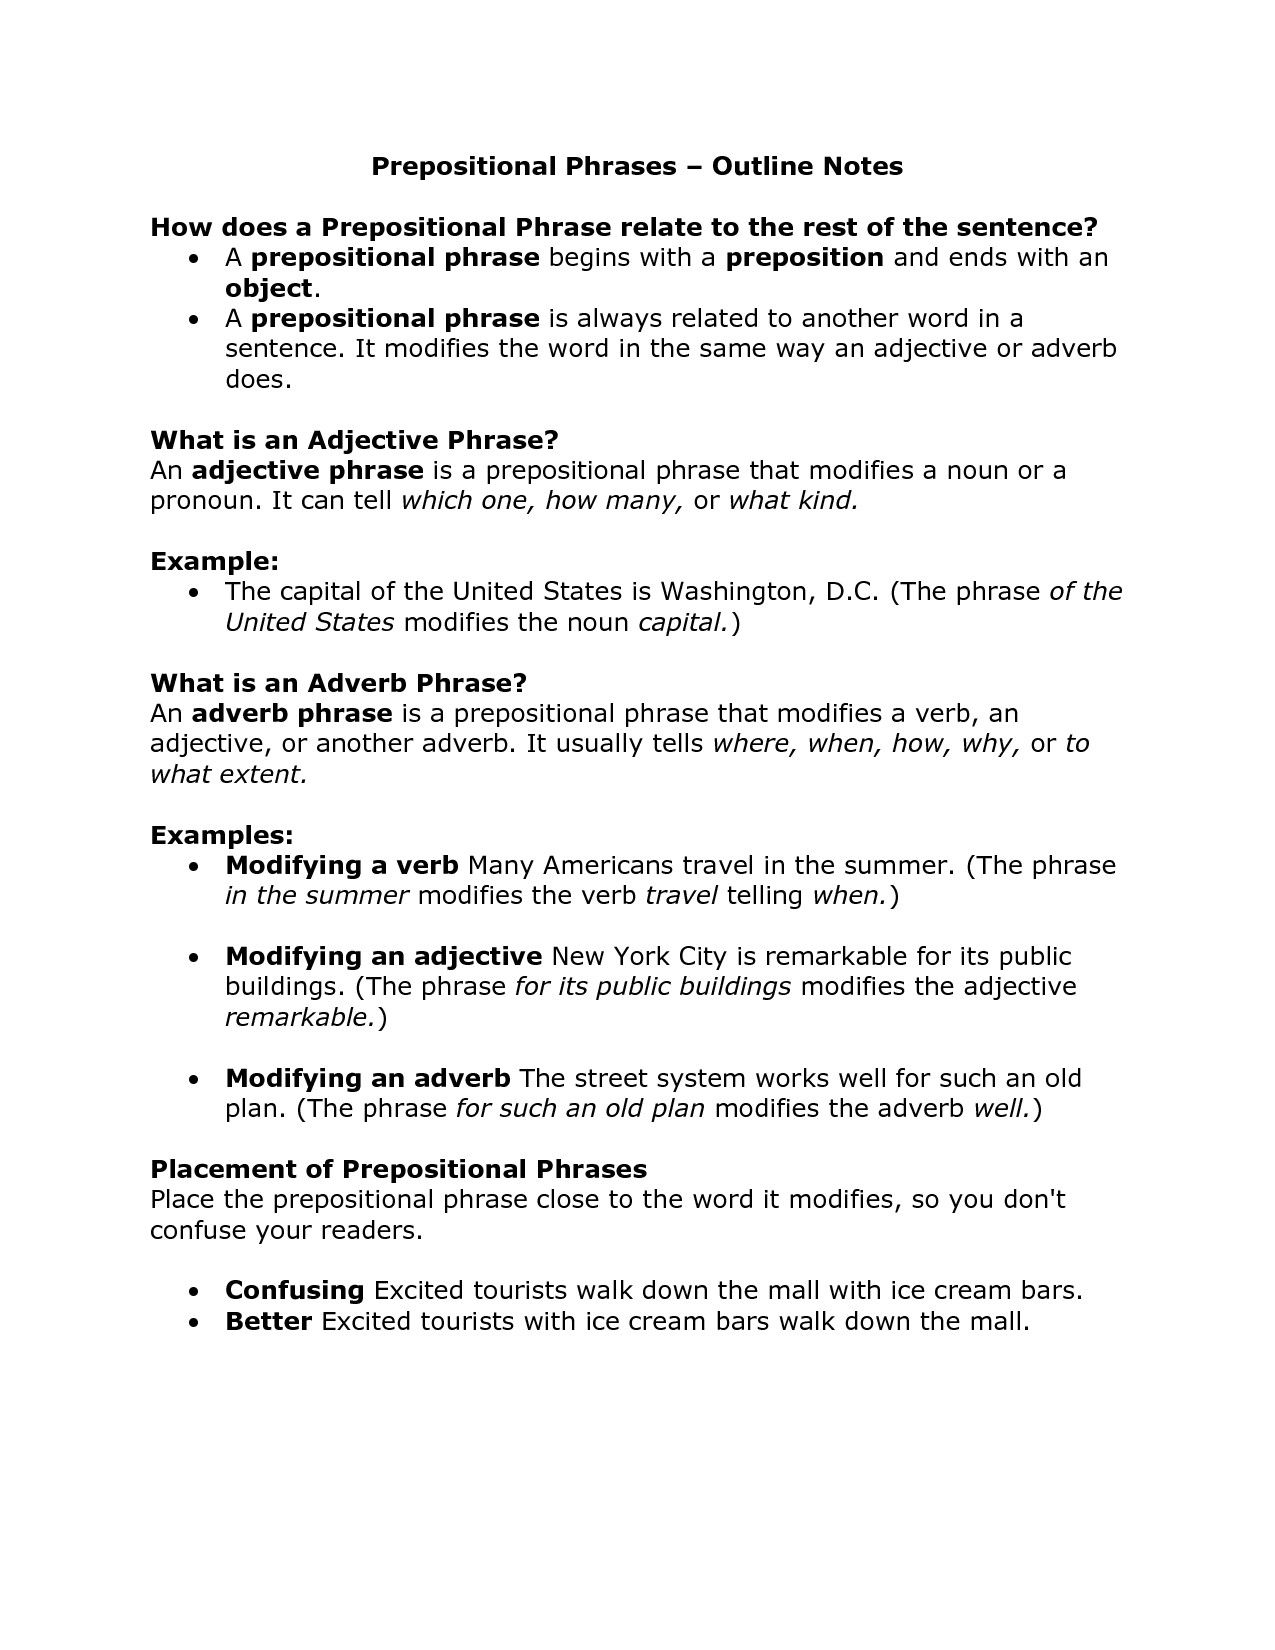 4 Worksheet Free Grammar Worksheets Fifth Grade 5 Adjectives Adverbs Prepositional Phrases Pr Prepositional Phrases Adverbial Phrases Grammar Worksheets Free prepositional phrases worksheets